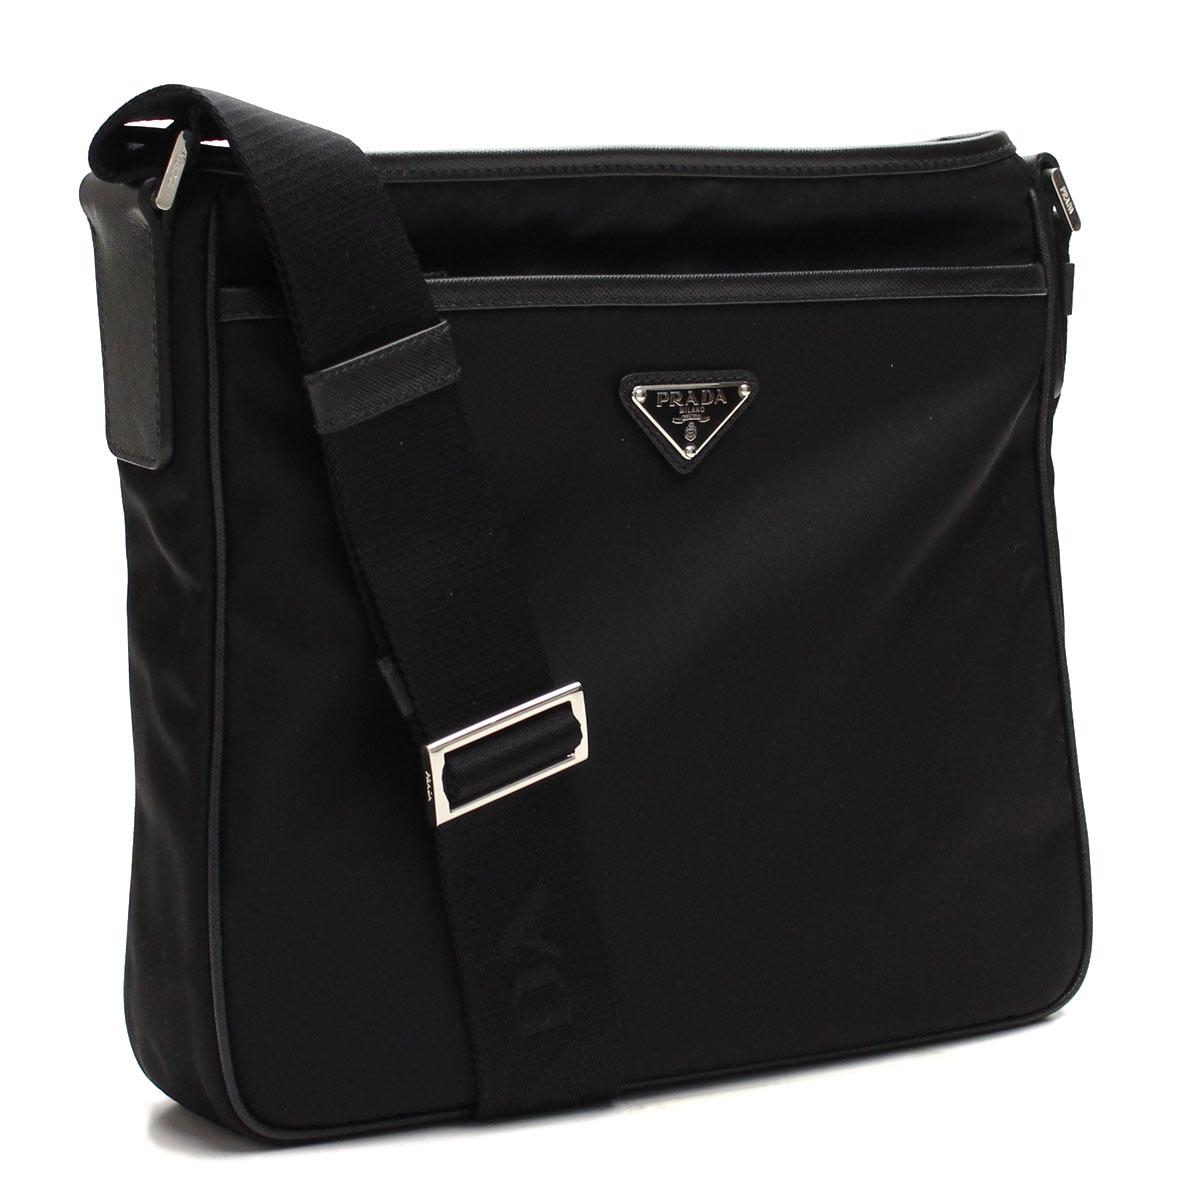 6c89167c7698 Bighit The total brand wholesale  Prada (PRADA) diagonally over the ...